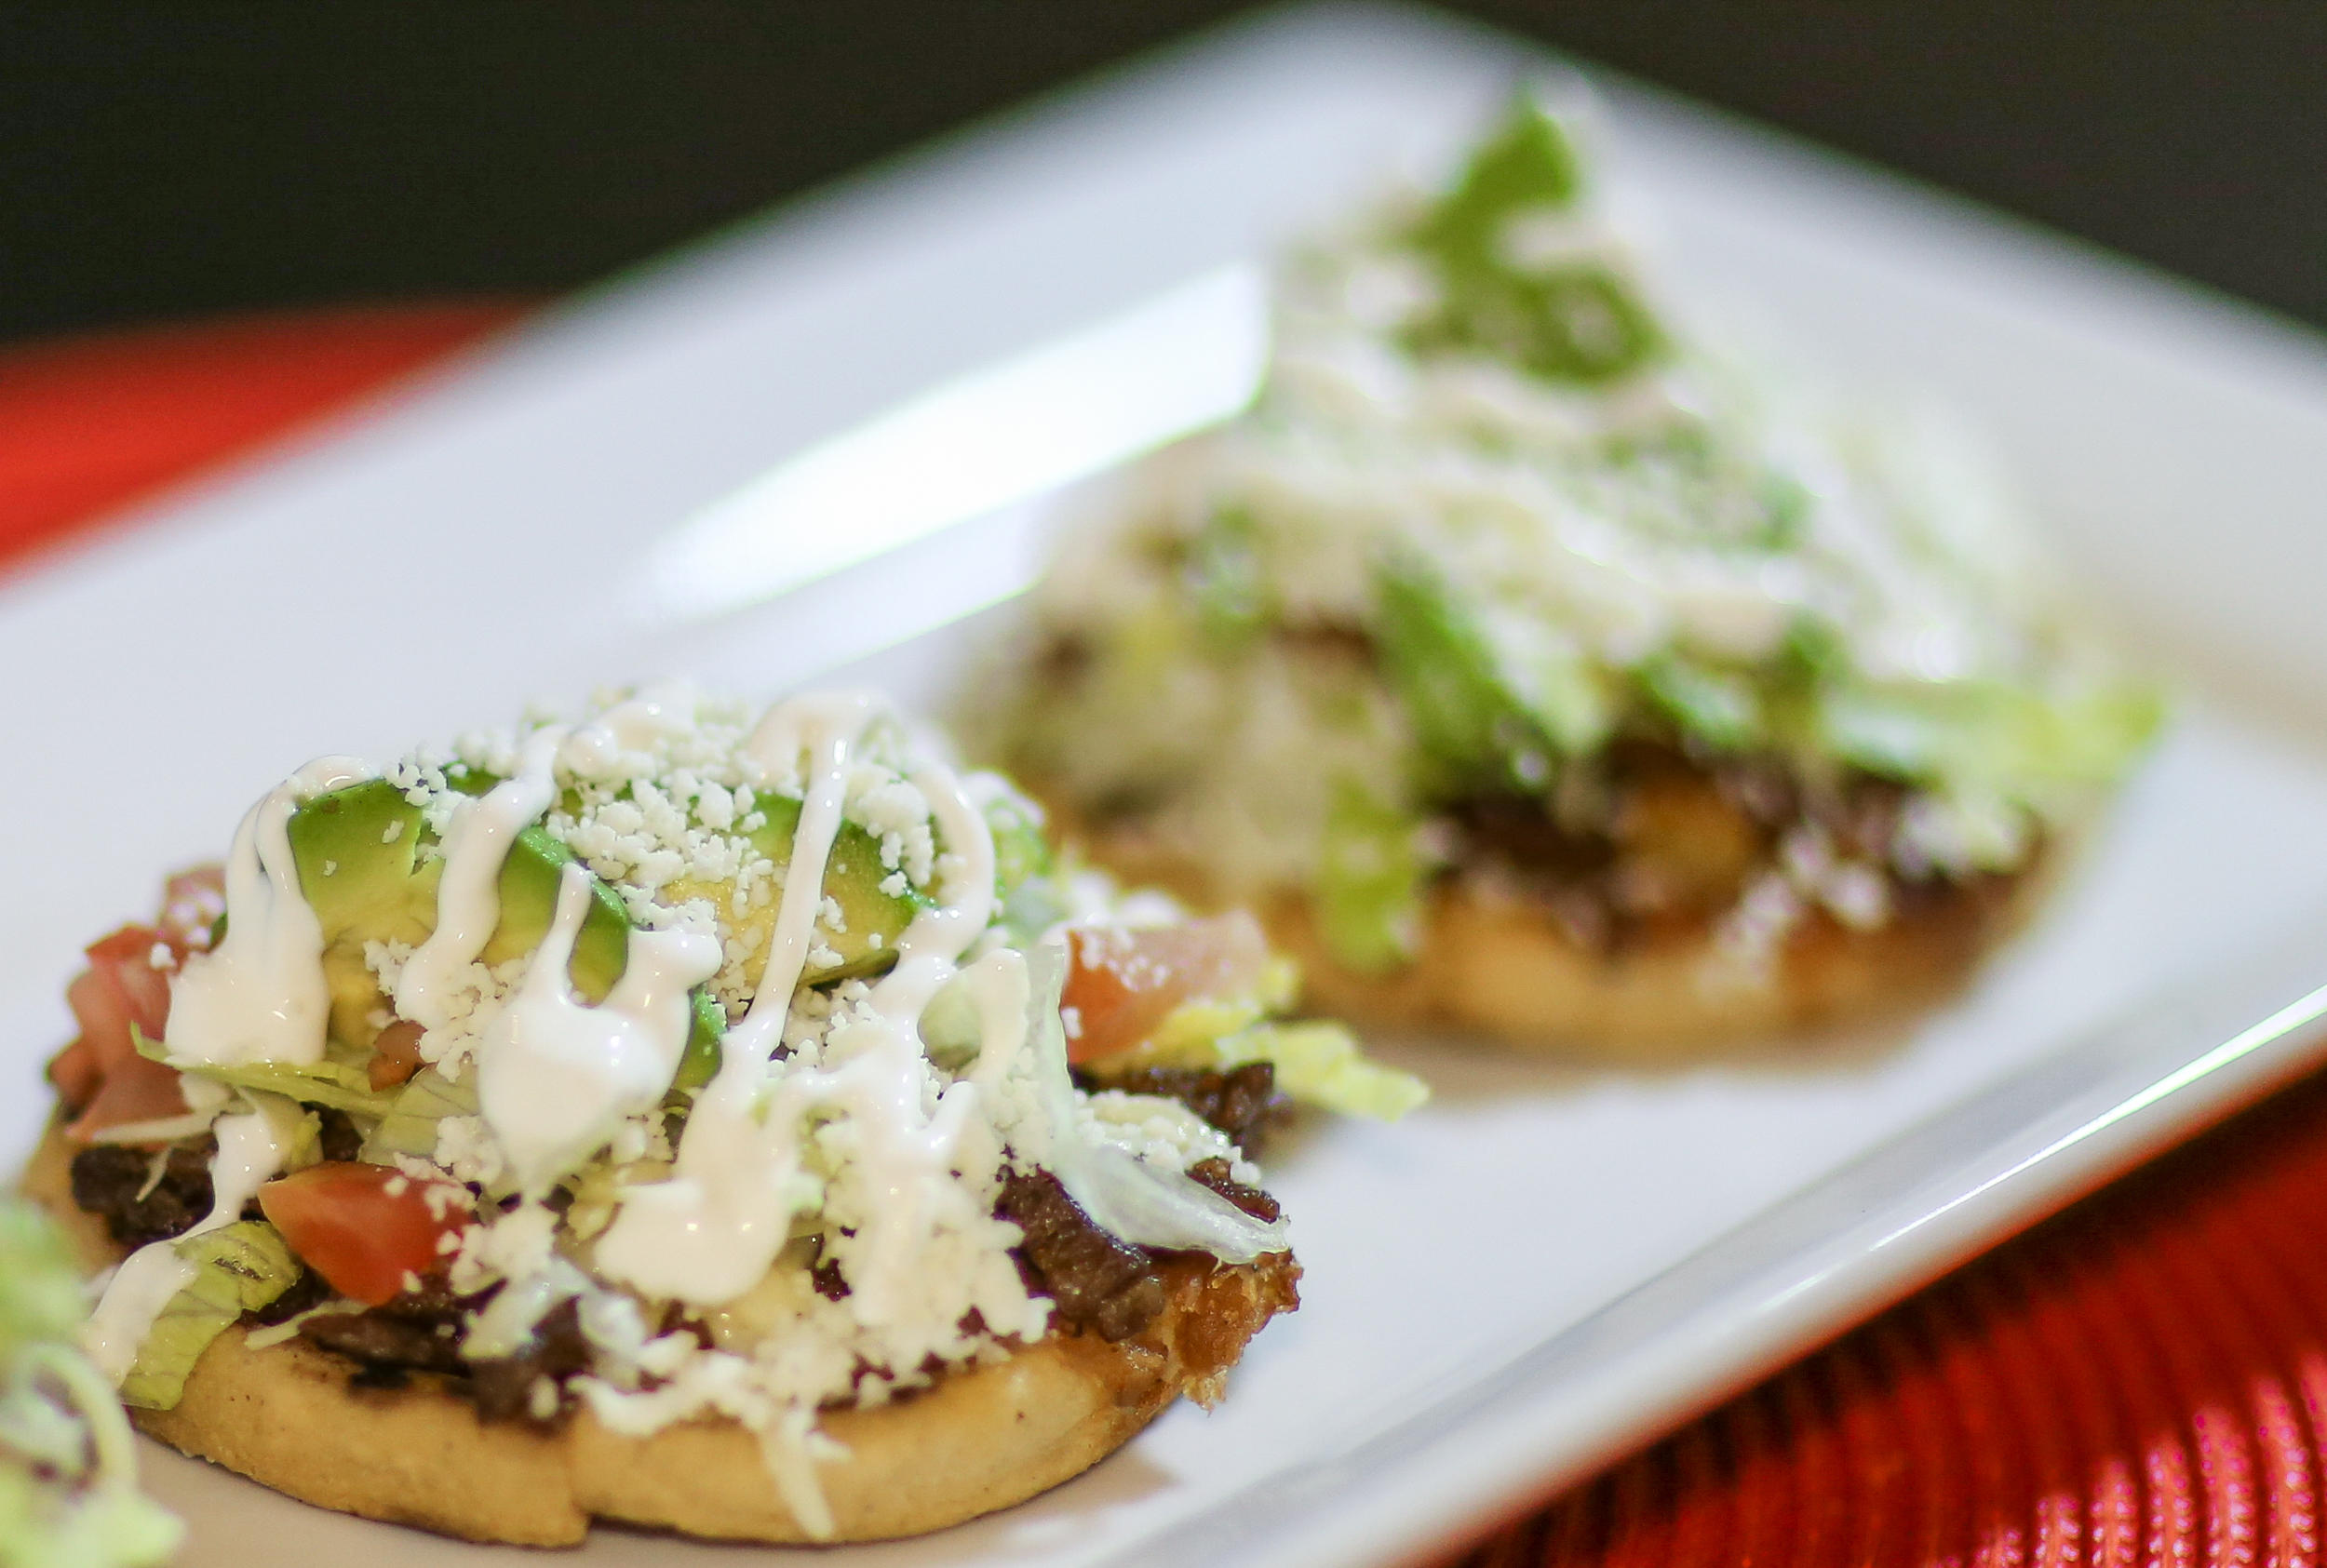 Habanero Mexican Restaurant image 2